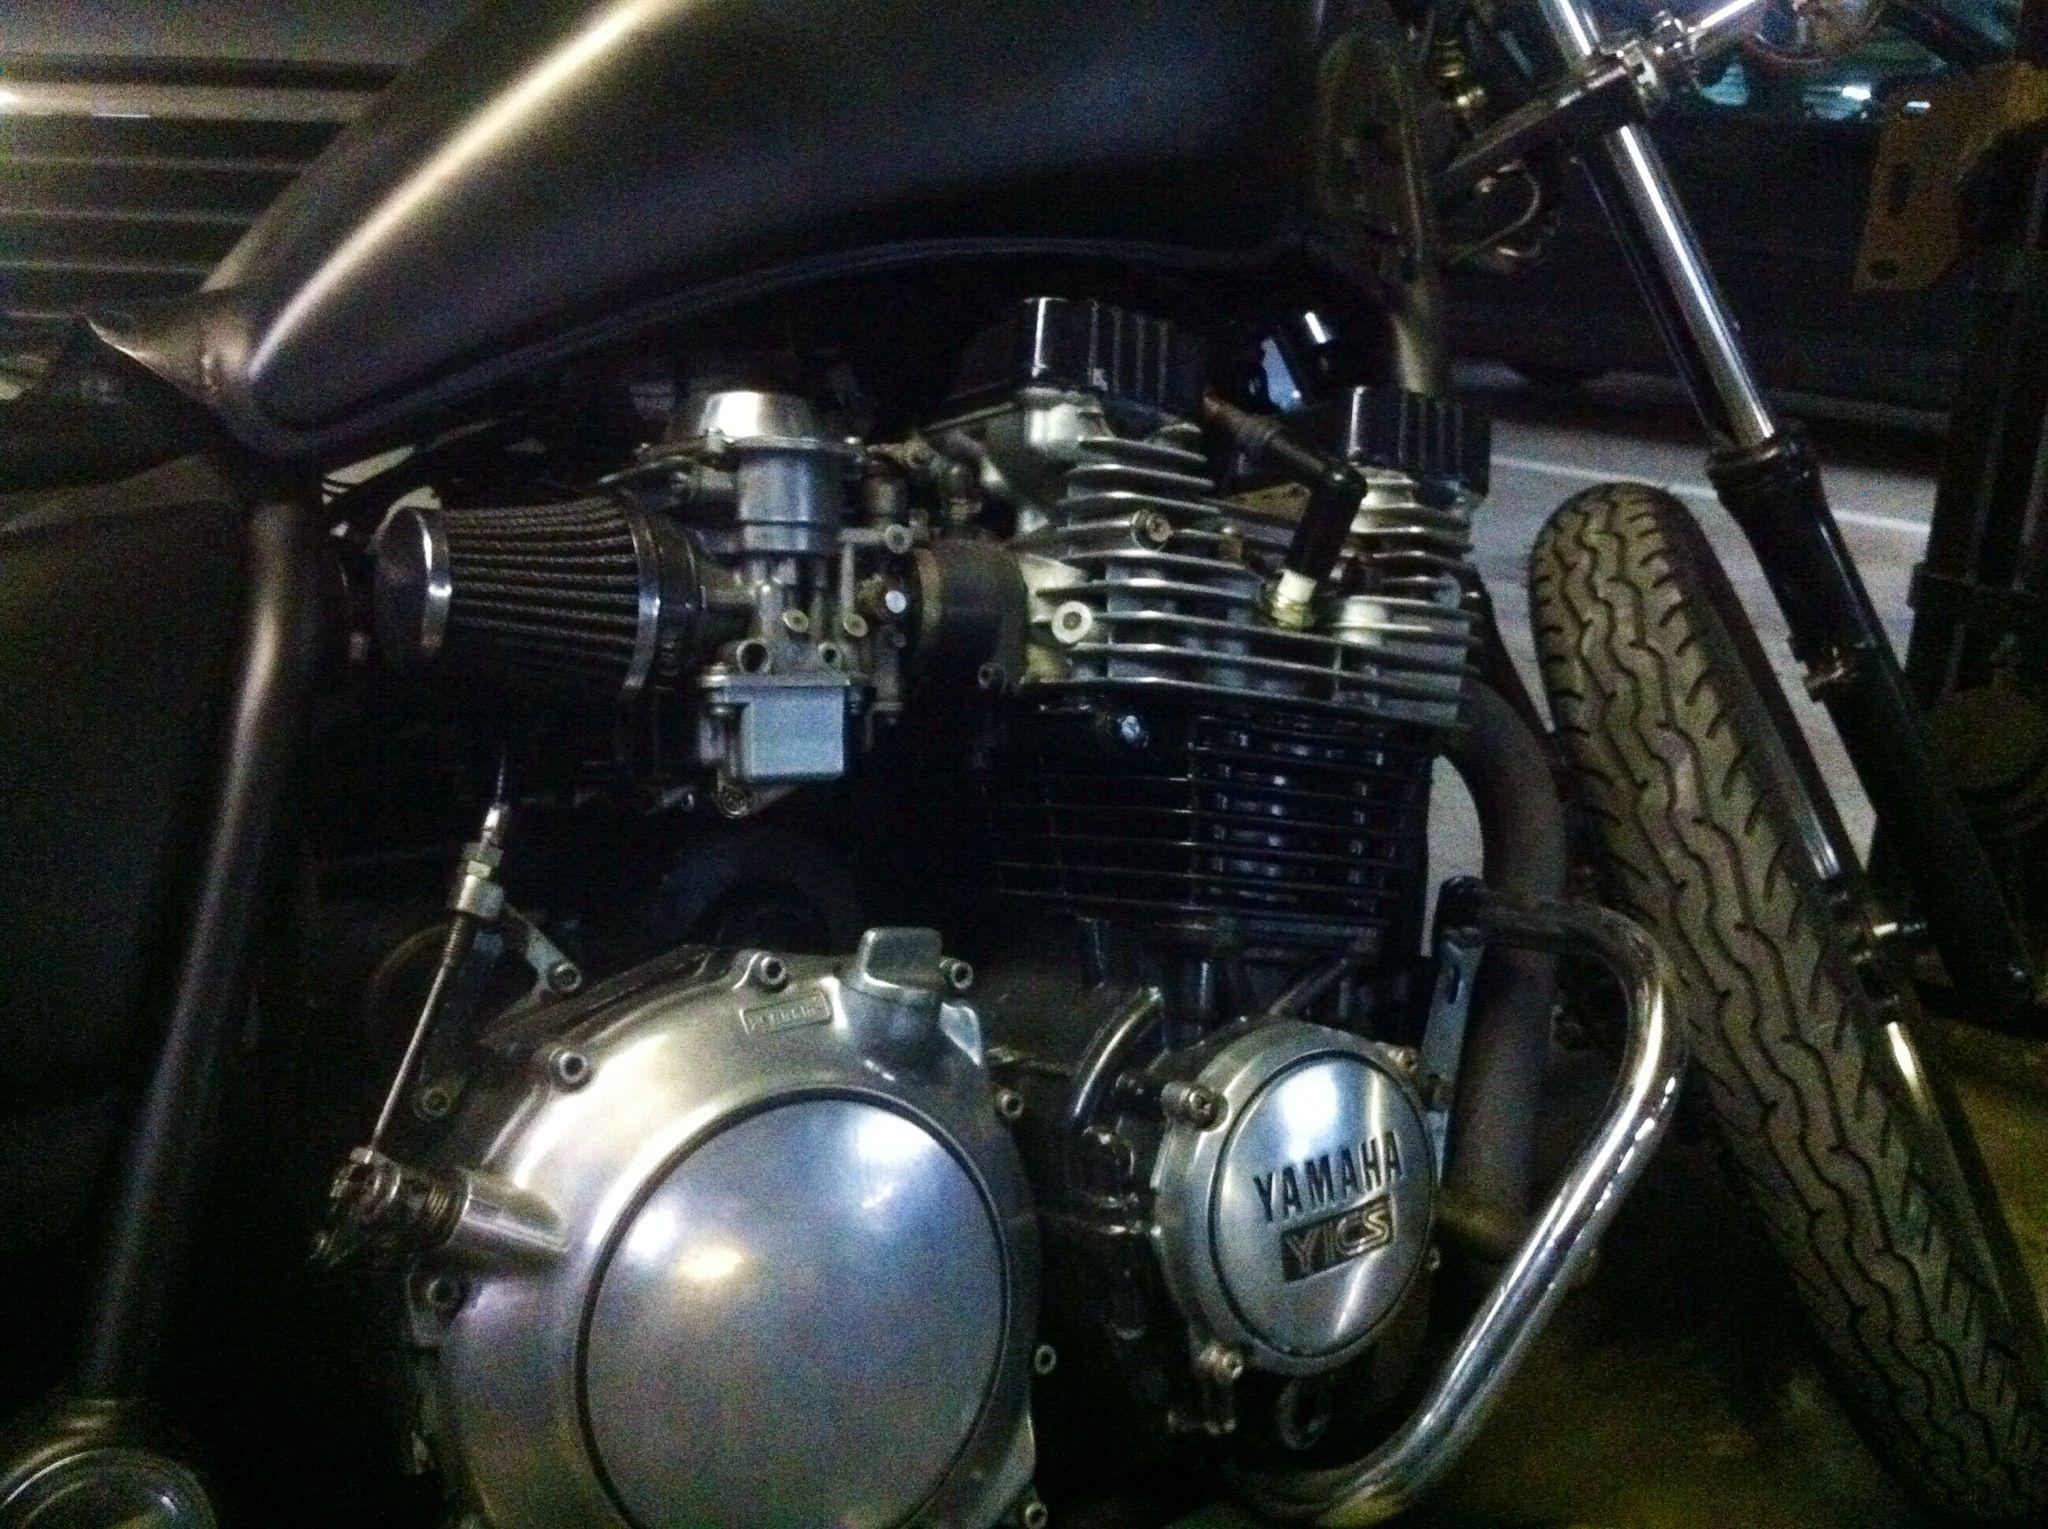 Yamaha project bobber